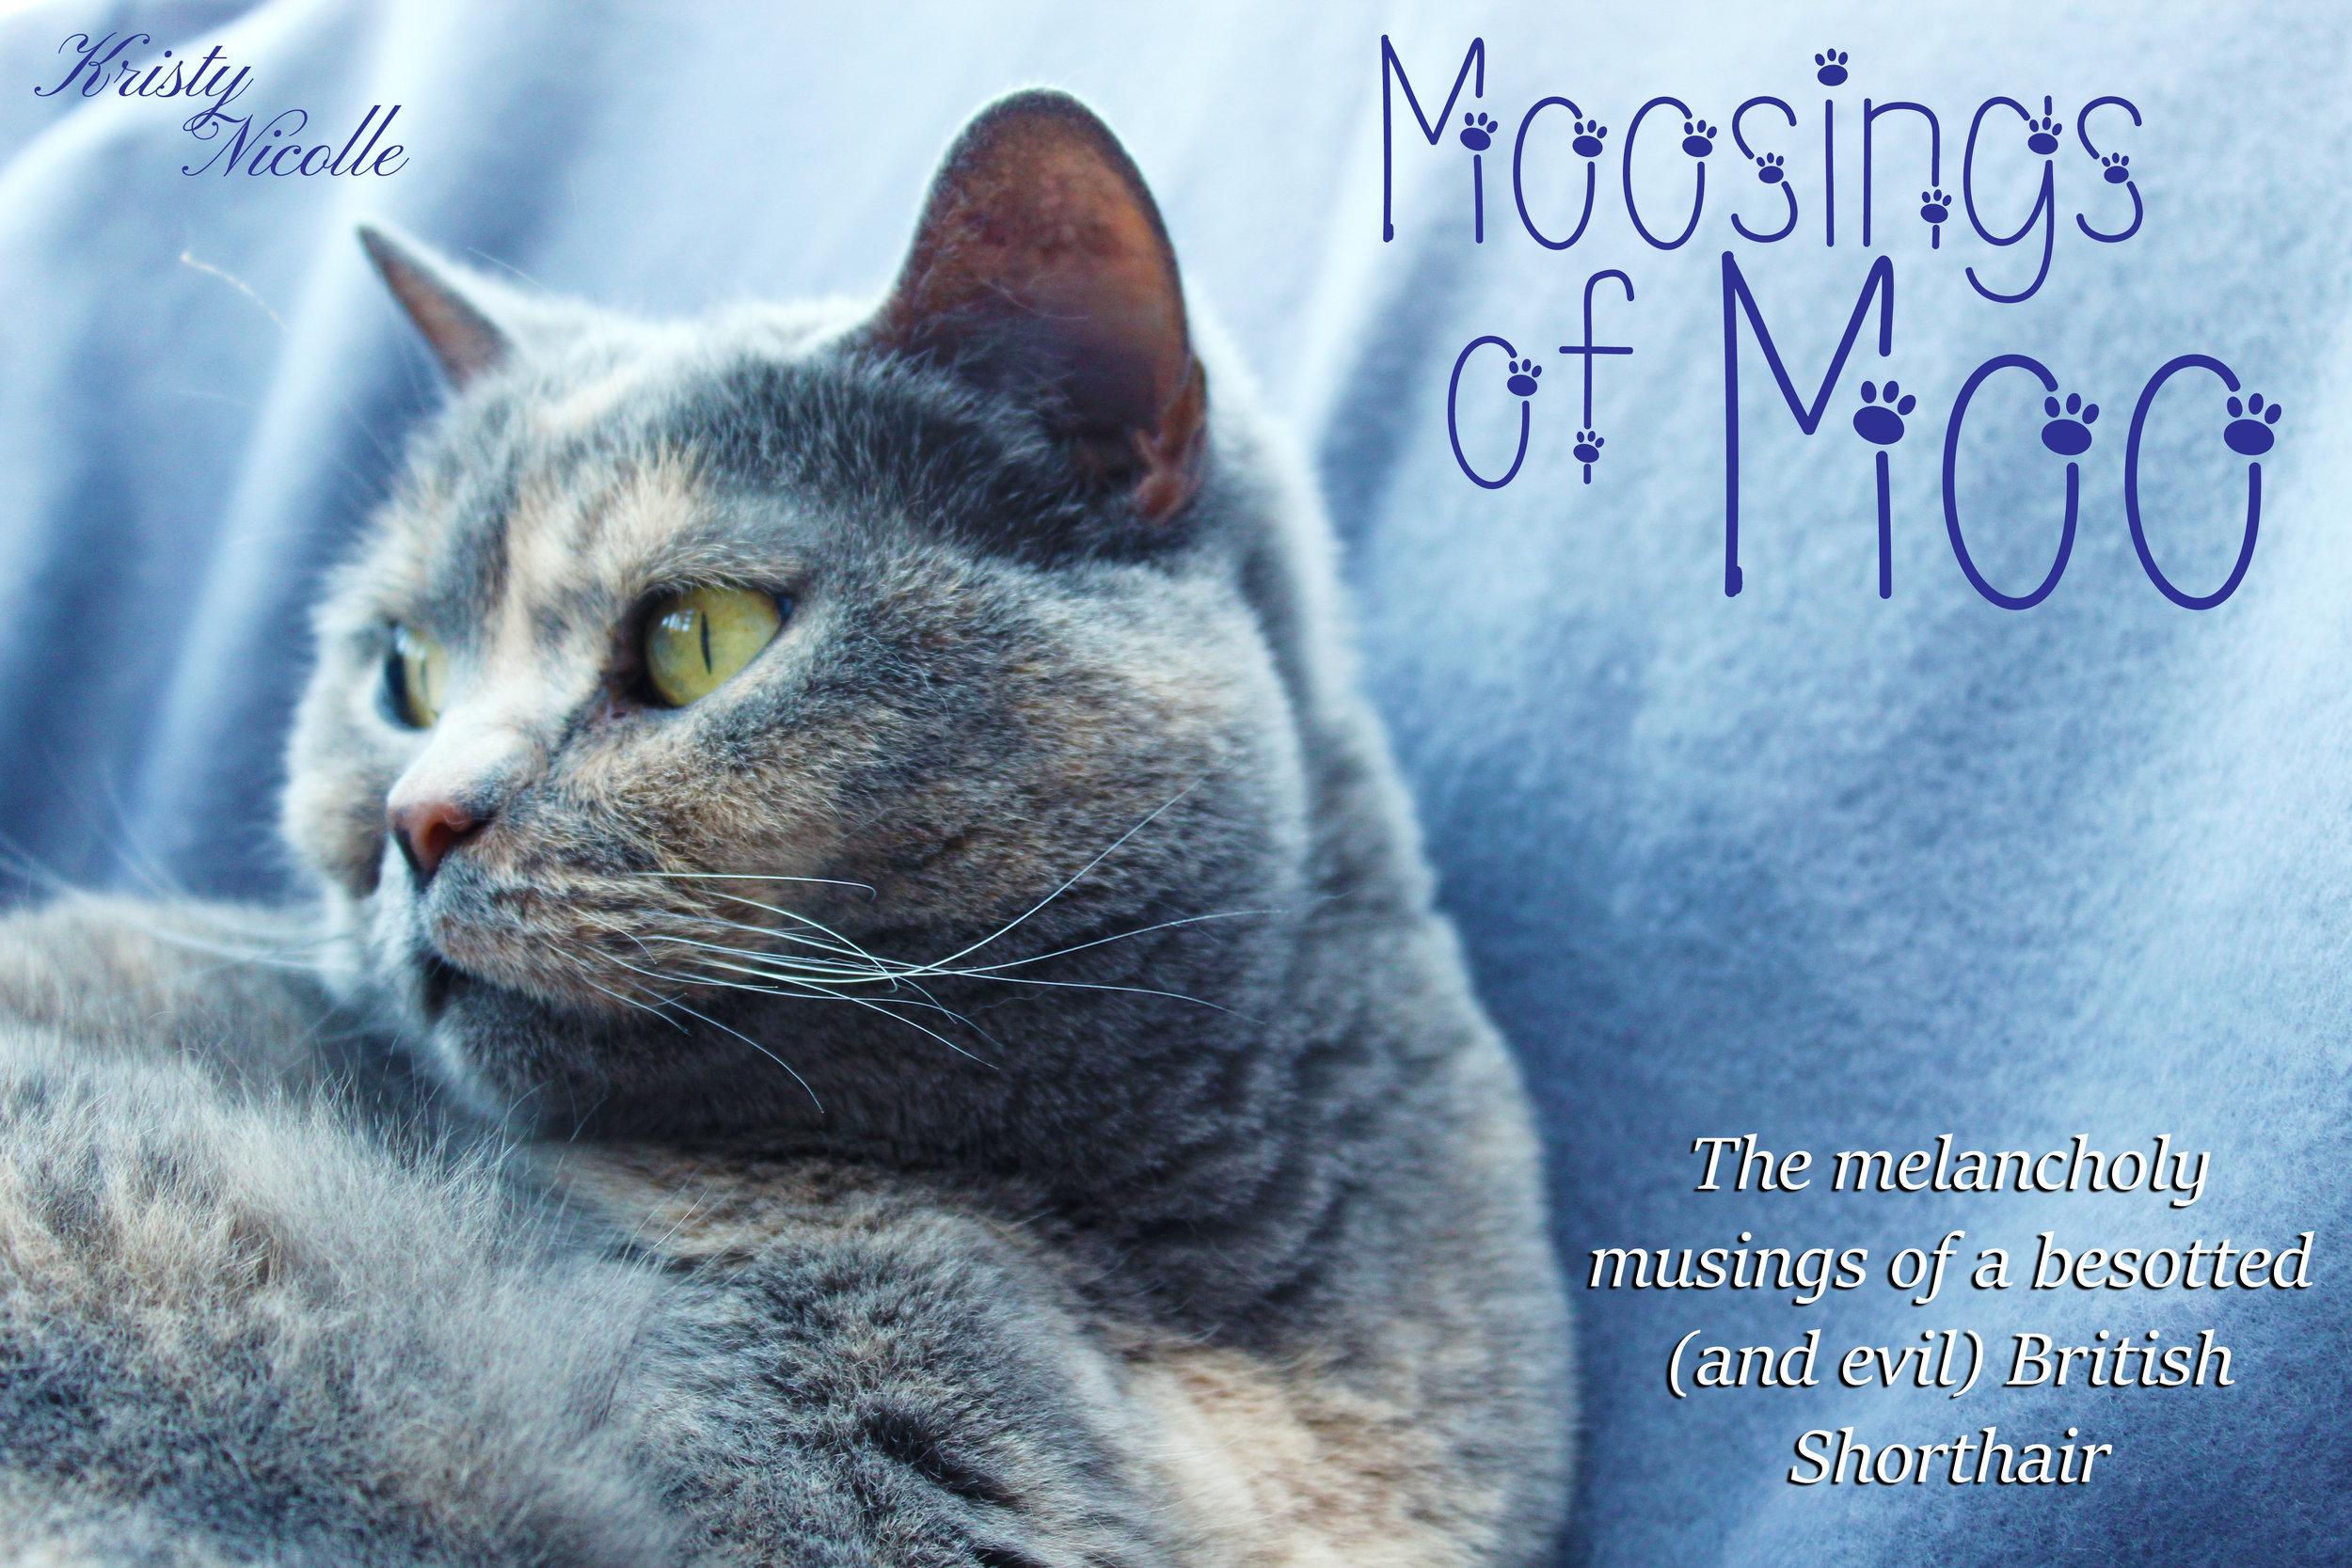 Welcome Thumb Peasants! - To the very melancholy Moosings of Moo…